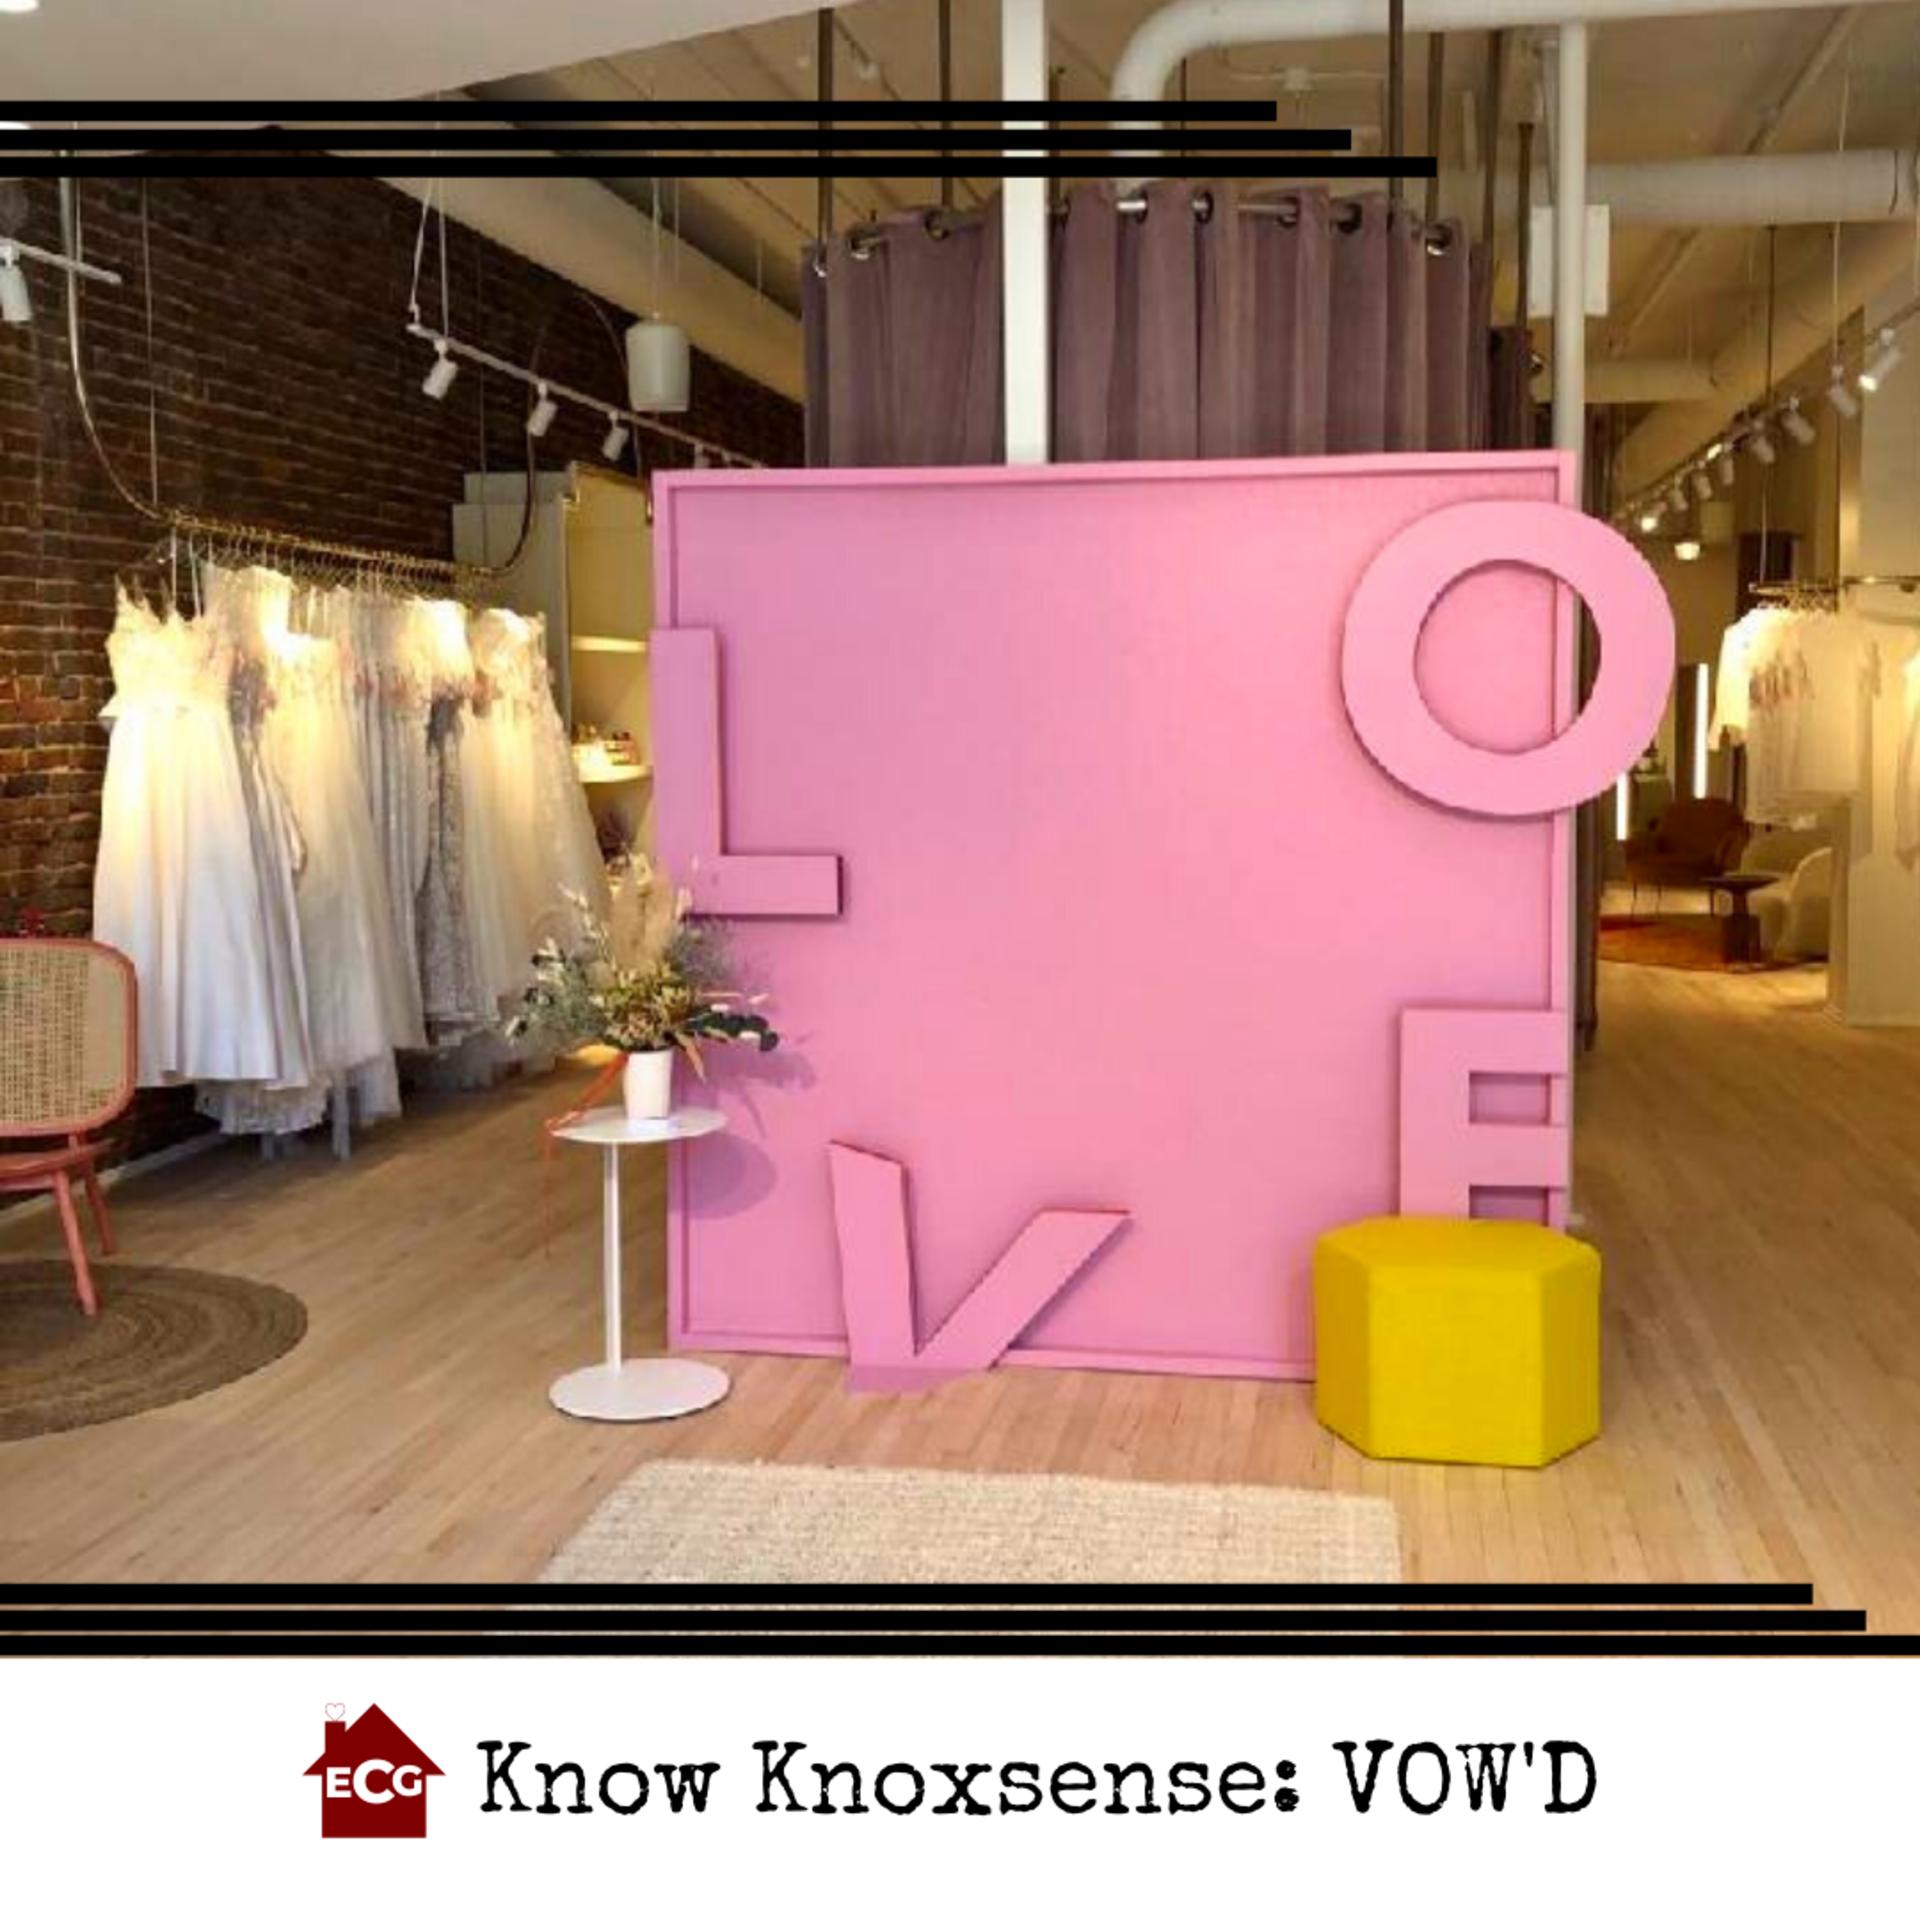 Know Knoxsense: Vow'd